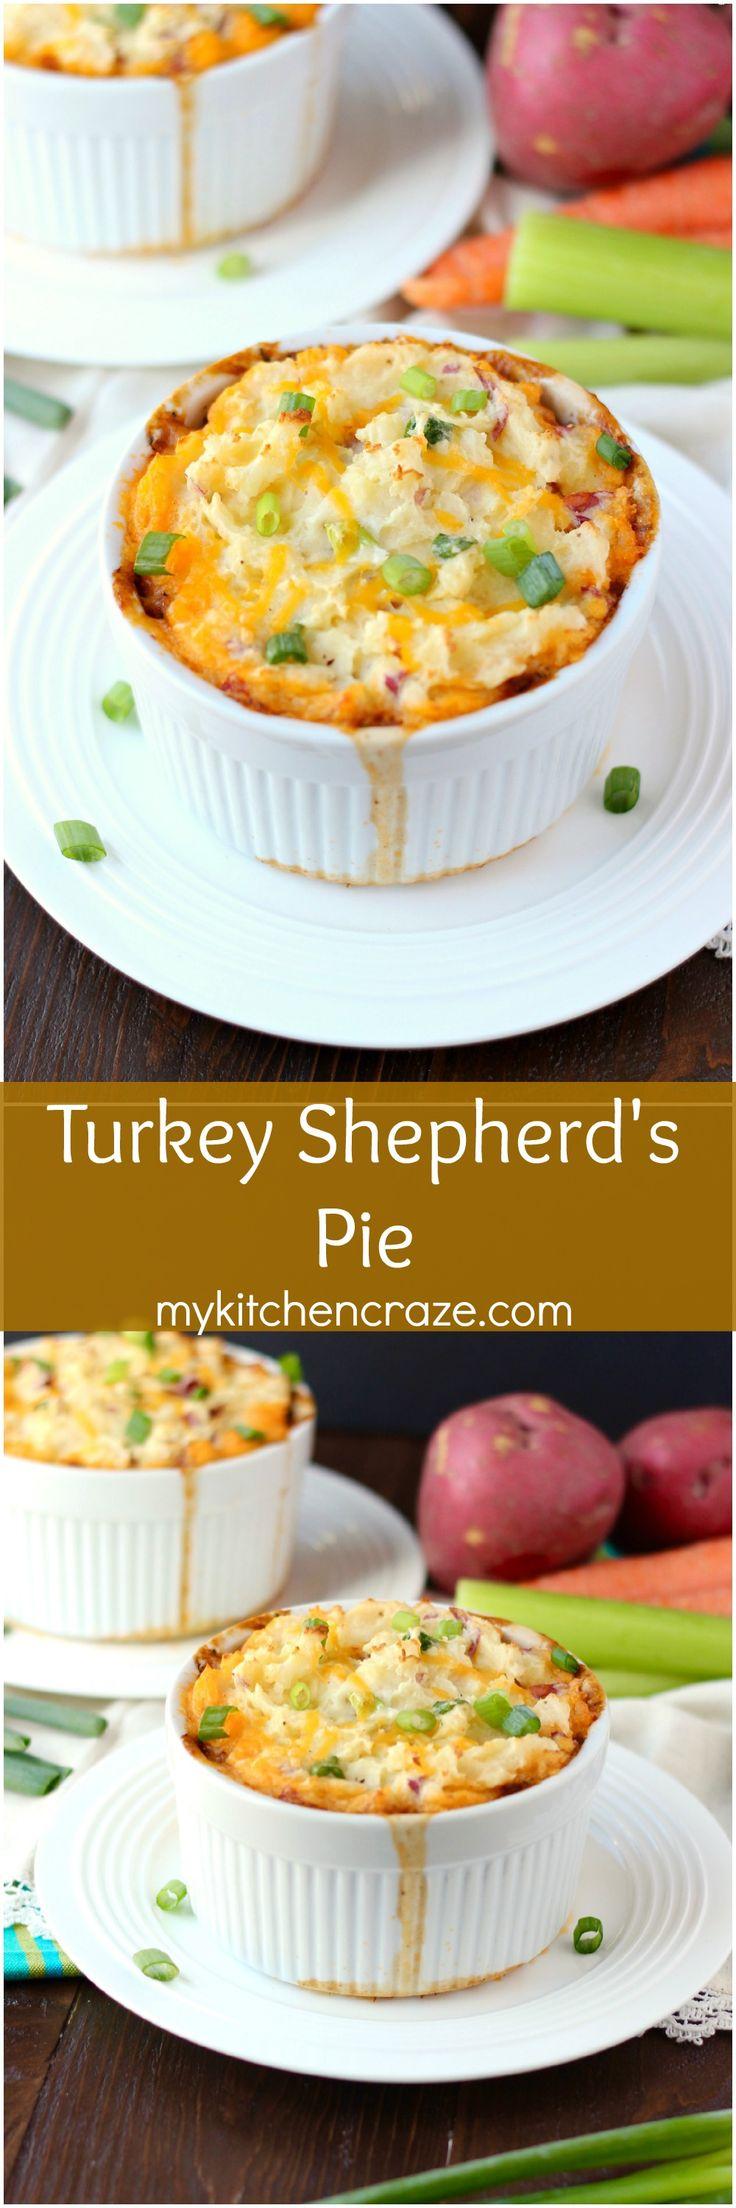 Turkey Shepherd's Pie ~ mykitchencraze.com ~ ##YesYouCAN #ad